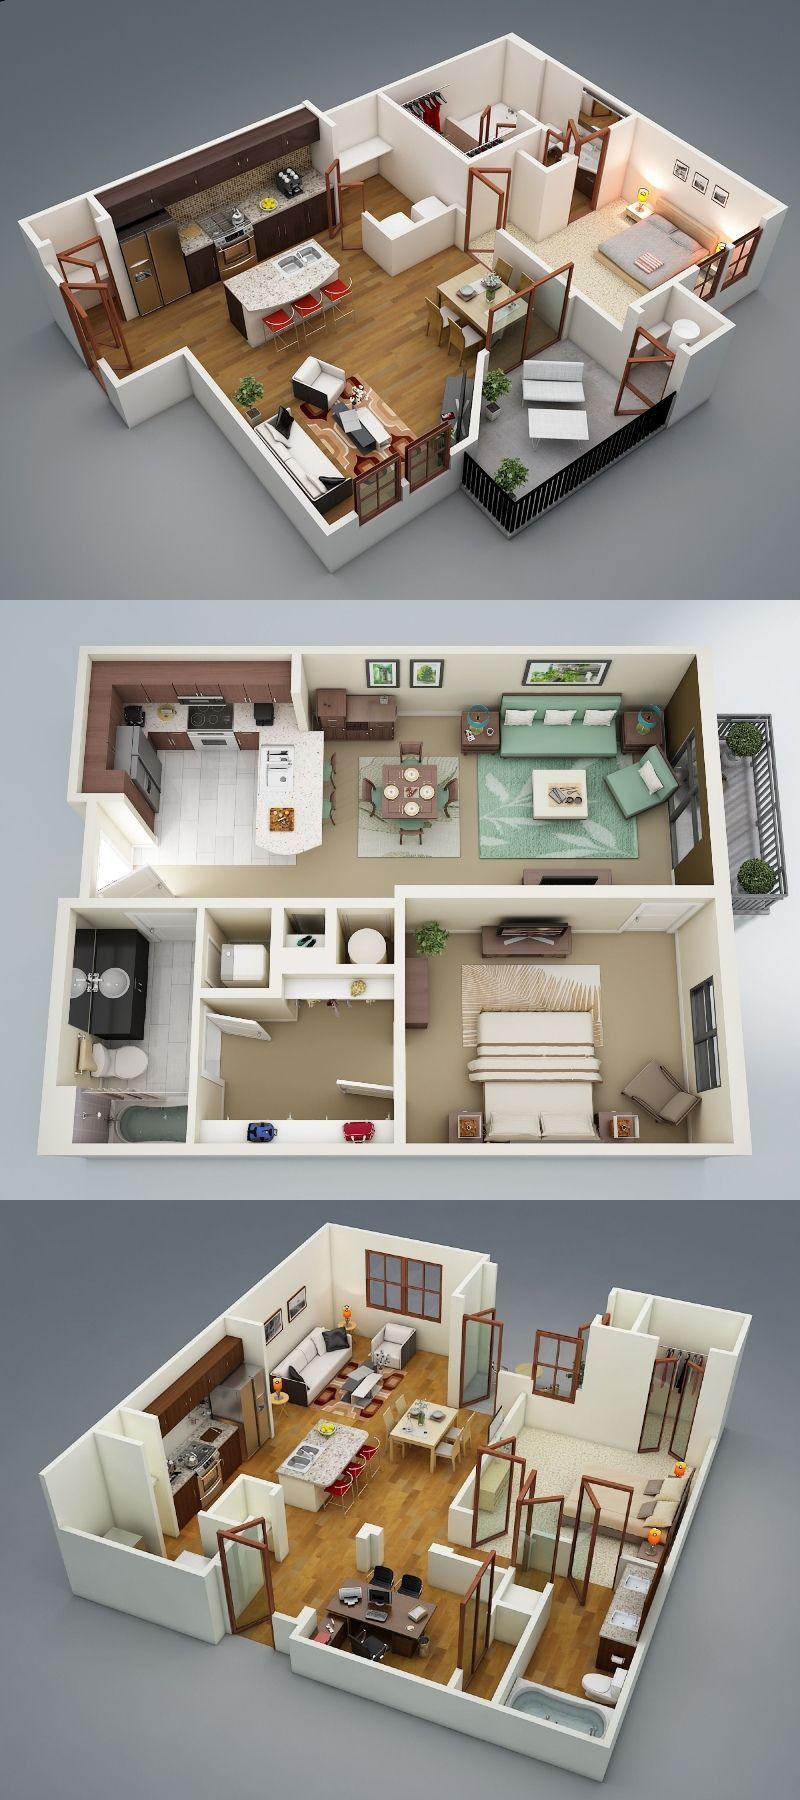 1 Bedroom Duplex House Plans 2021 Home Design Plans Living Room Decor Apartment House Design